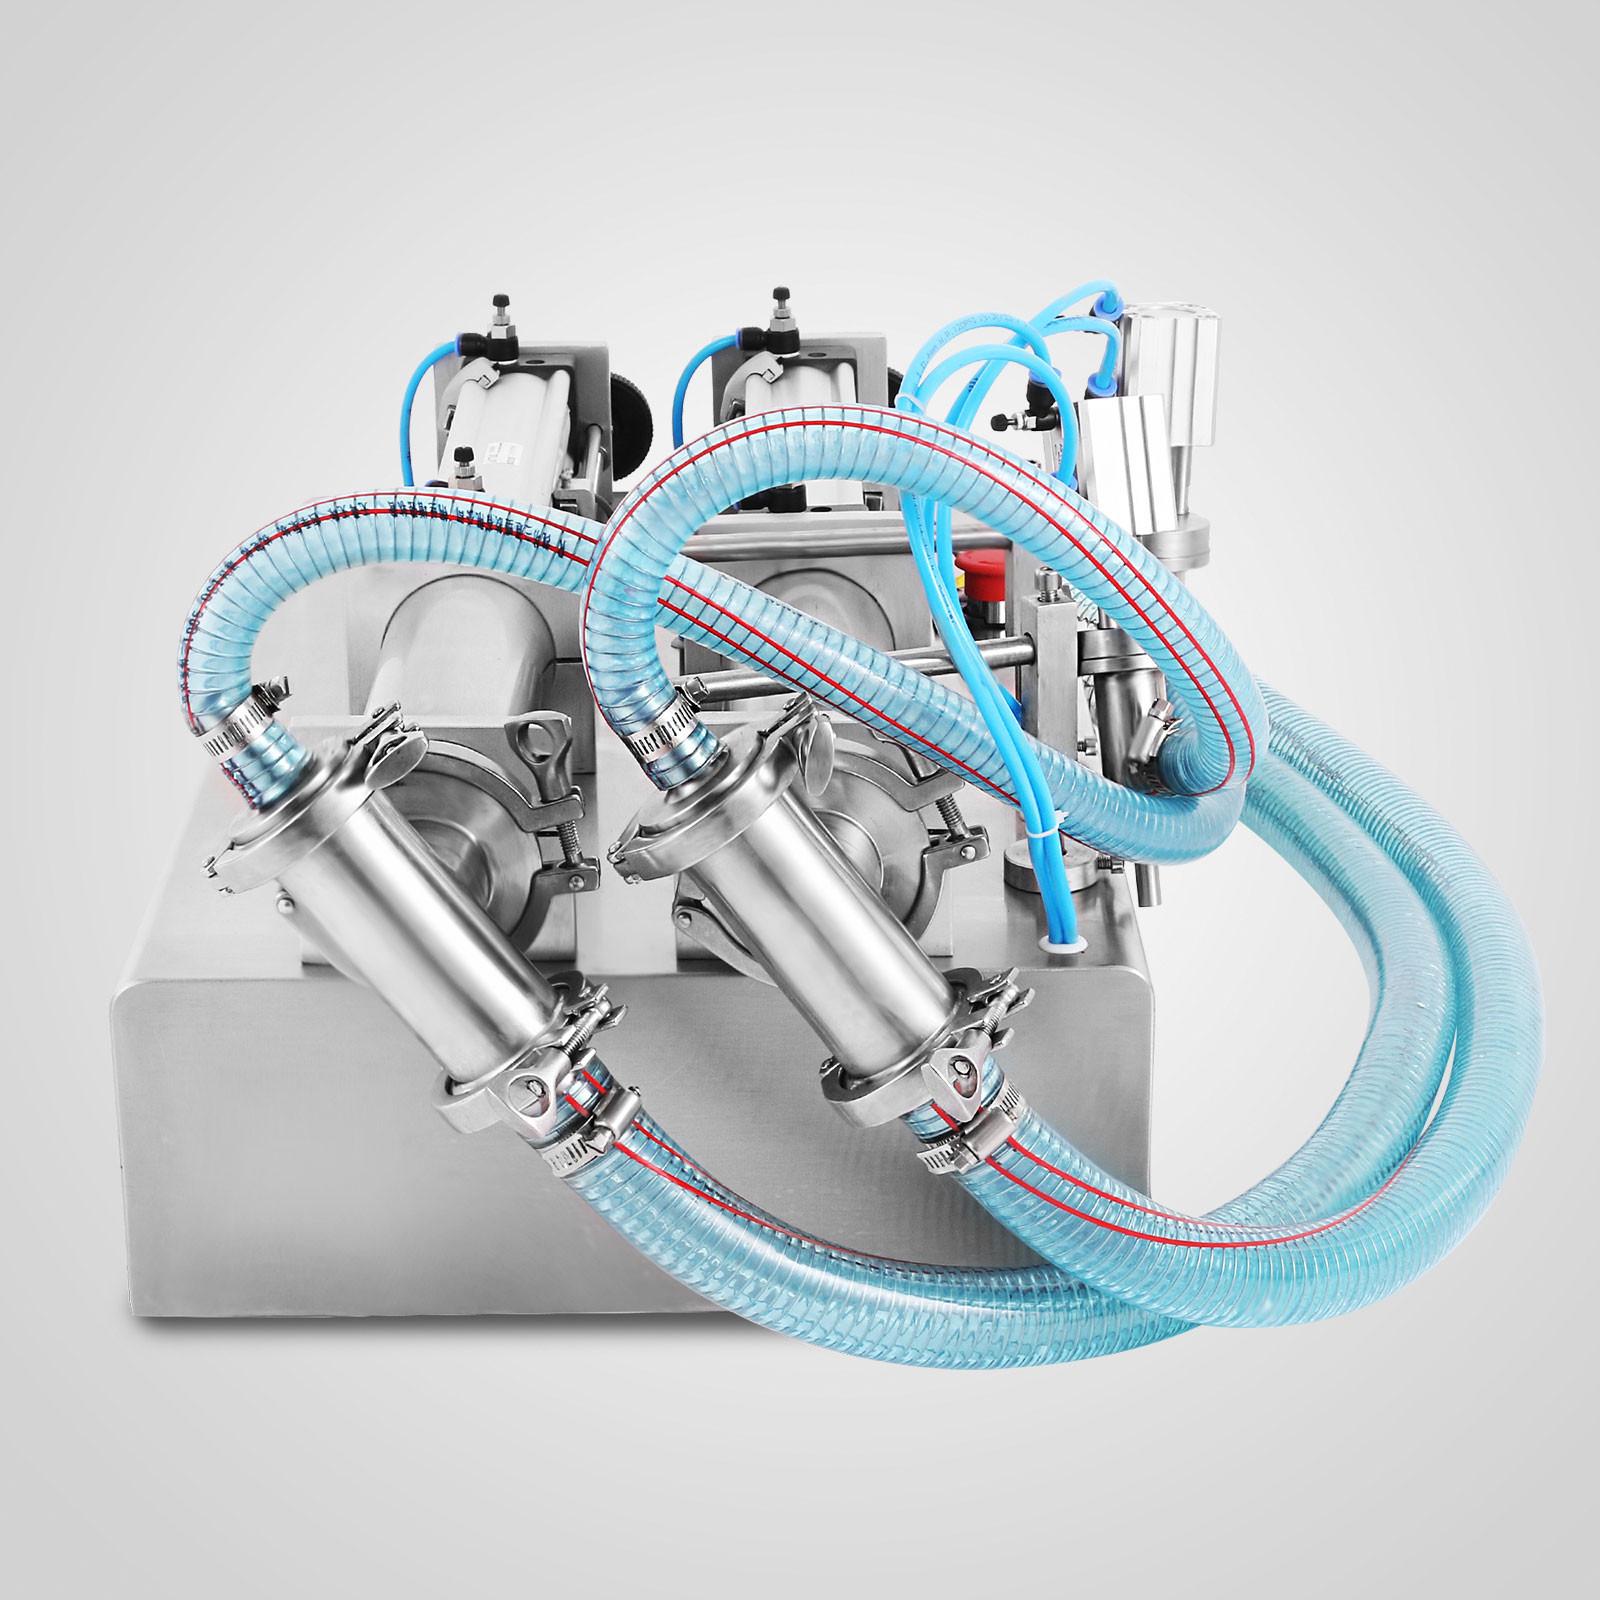 Liquid-Filling-Machine-Filler-Remplissage-2-3500ML-50-500ML-INDUSTRY-SUPPLY miniature 81